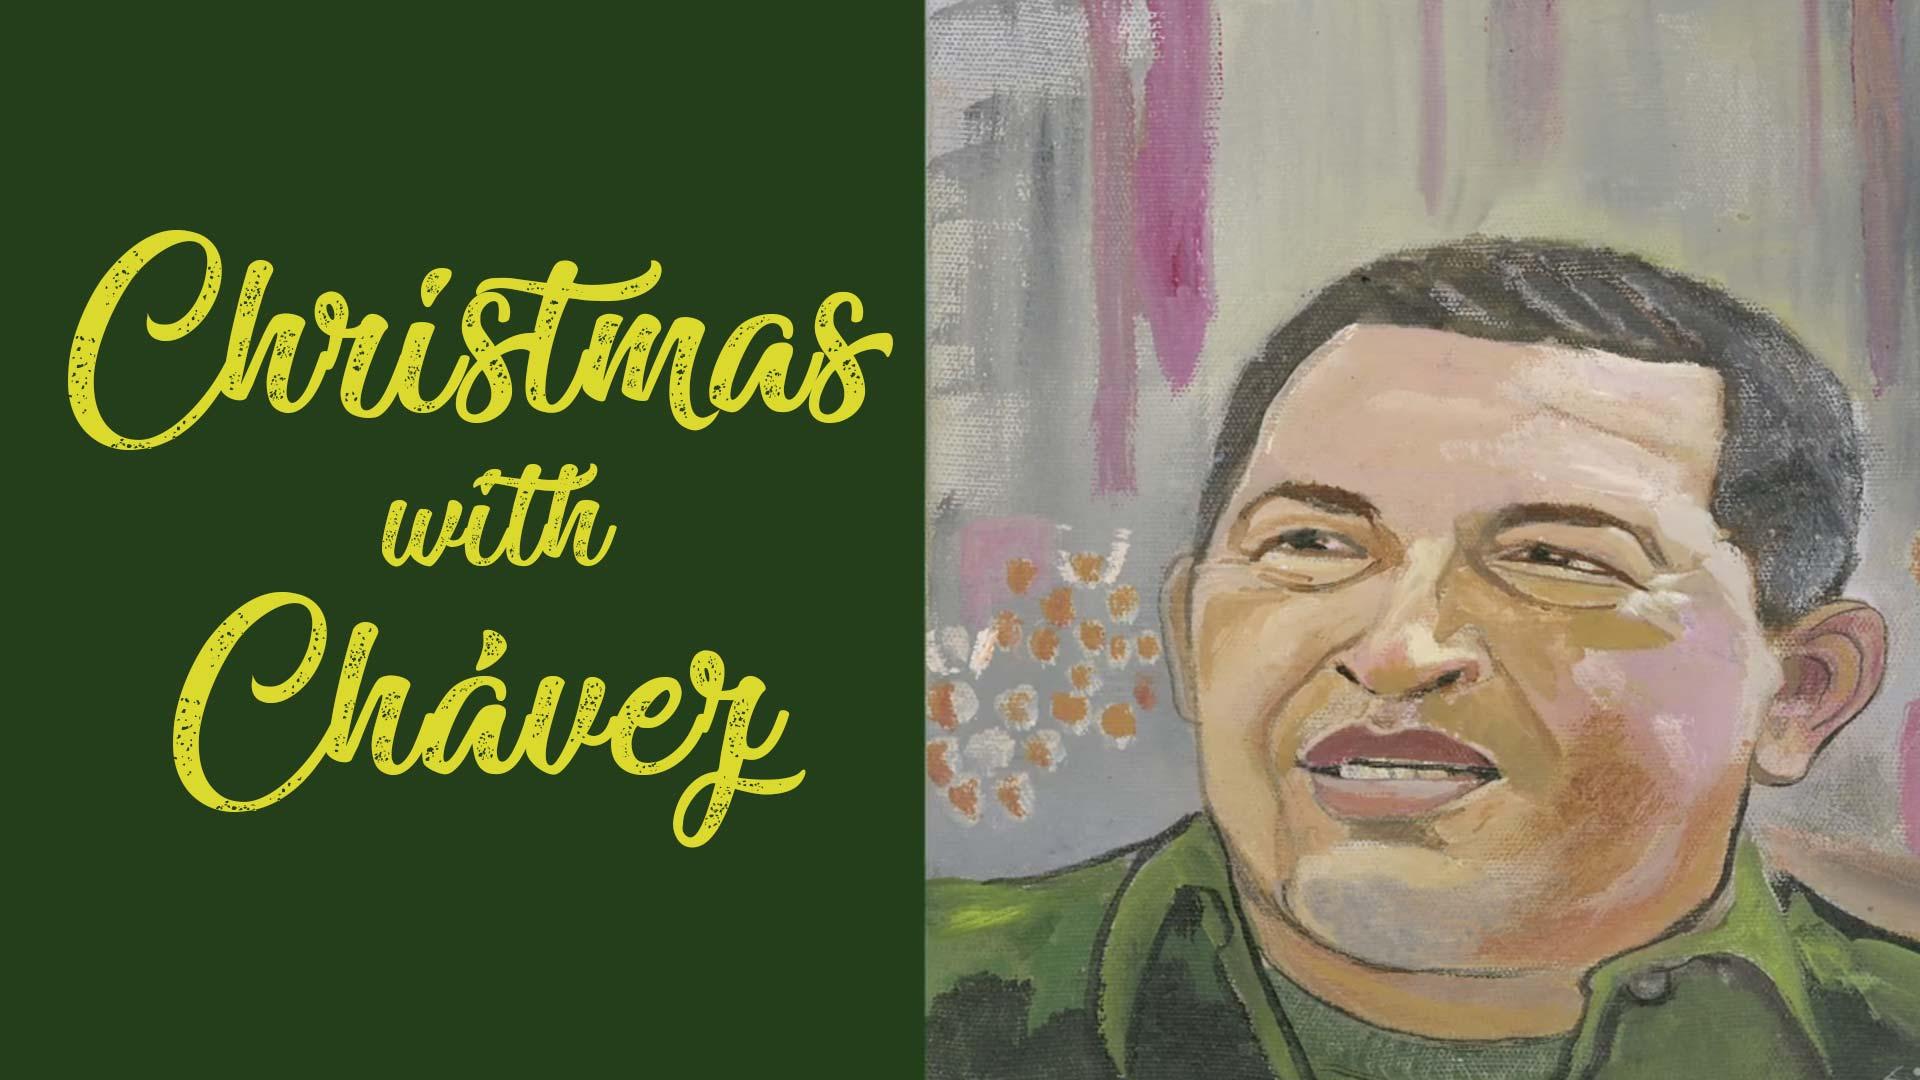 Christmas with Chávez - image